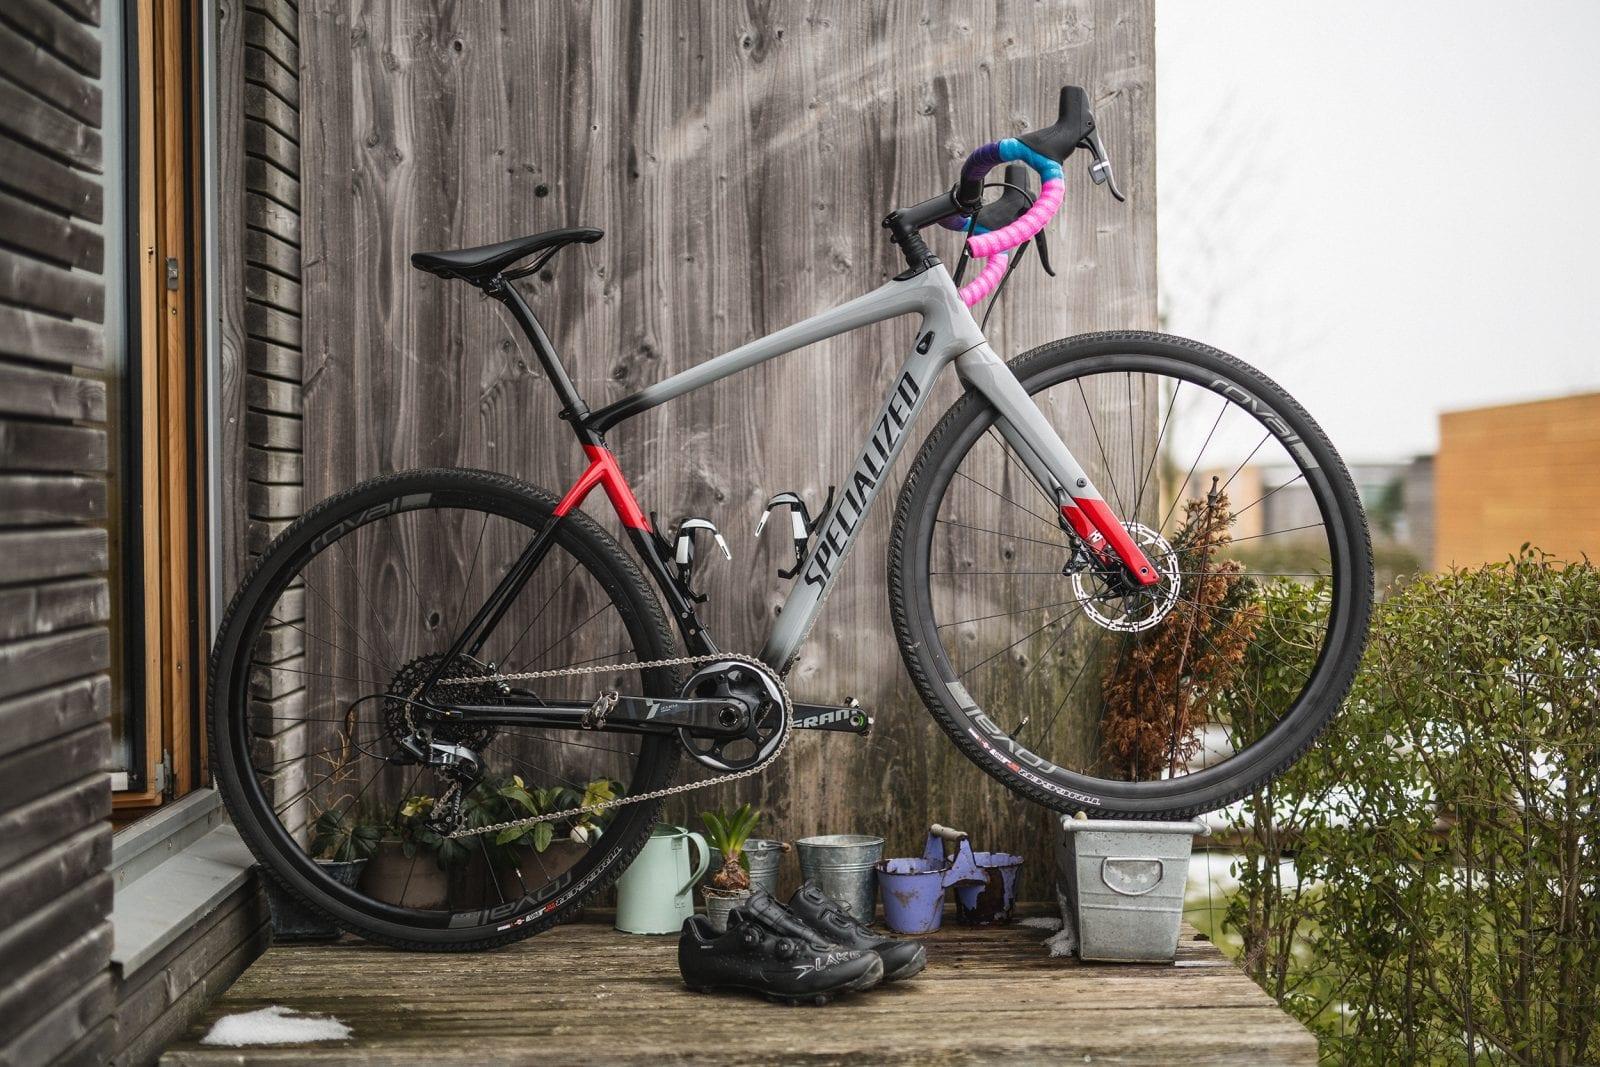 Land Run 2018 AltomCykling.dk